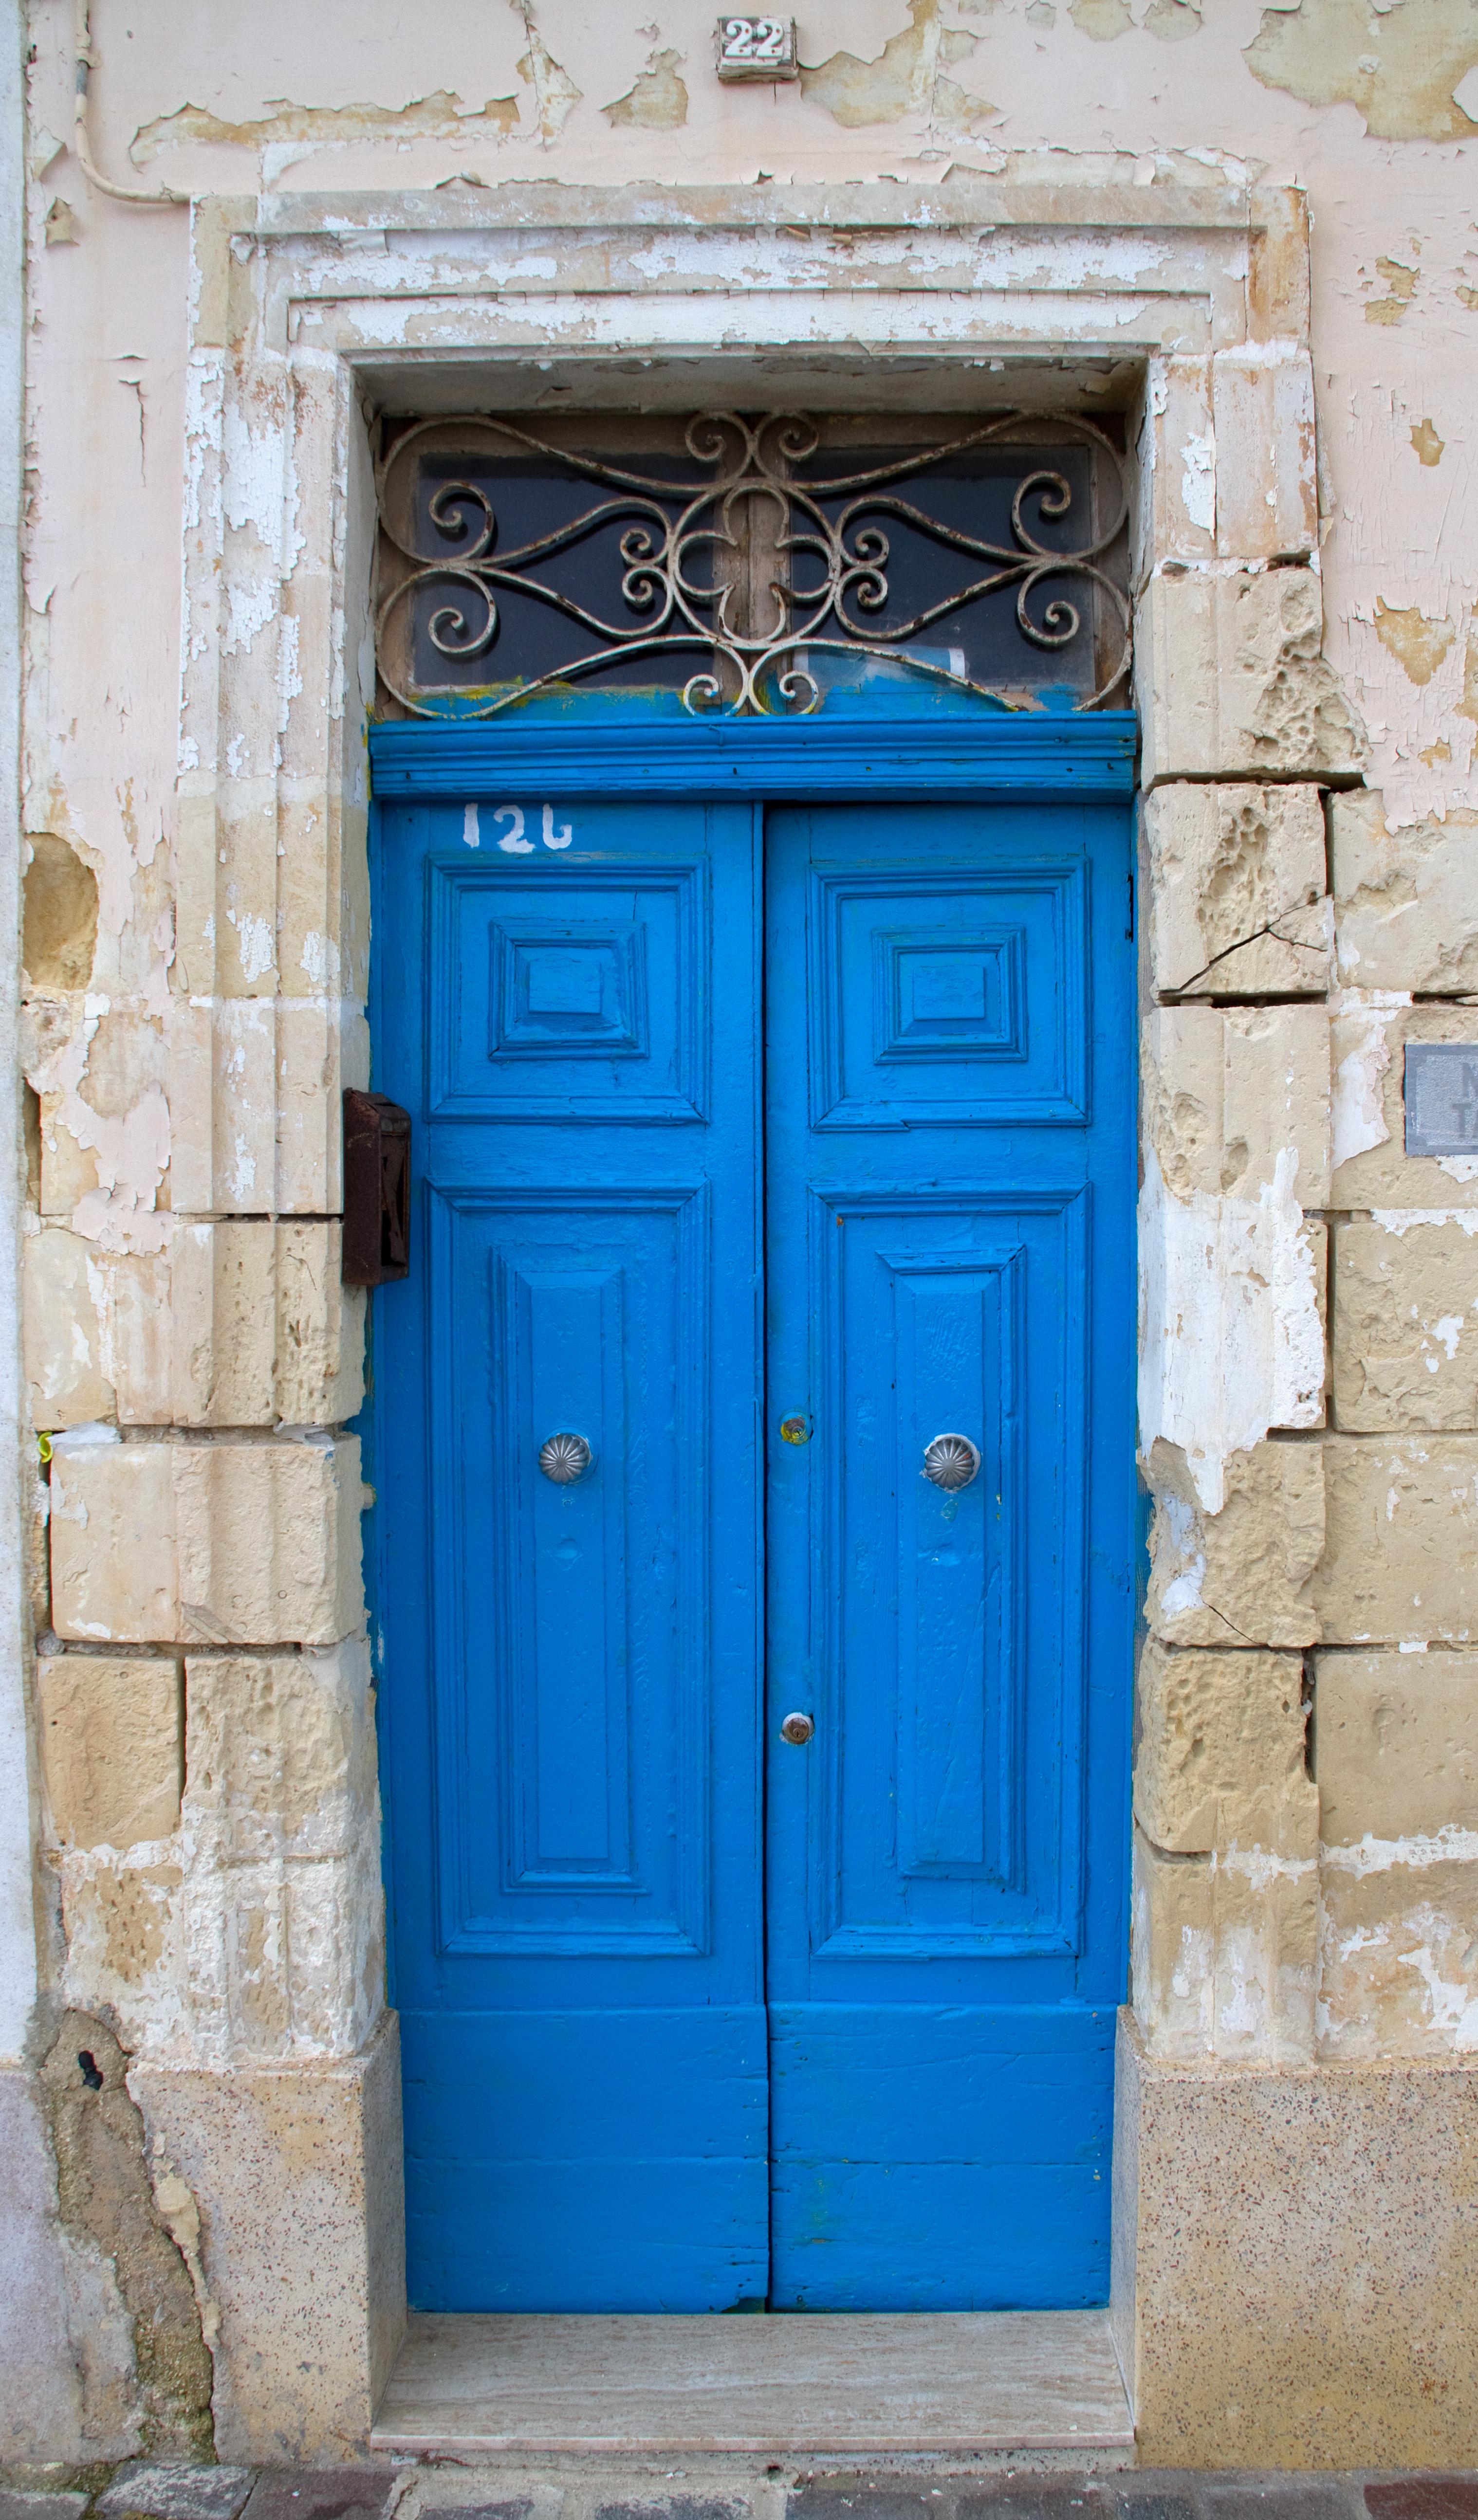 FileBlue Door Marsaxlokk (6800186240).jpg & File:Blue Door Marsaxlokk (6800186240).jpg - Wikimedia Commons